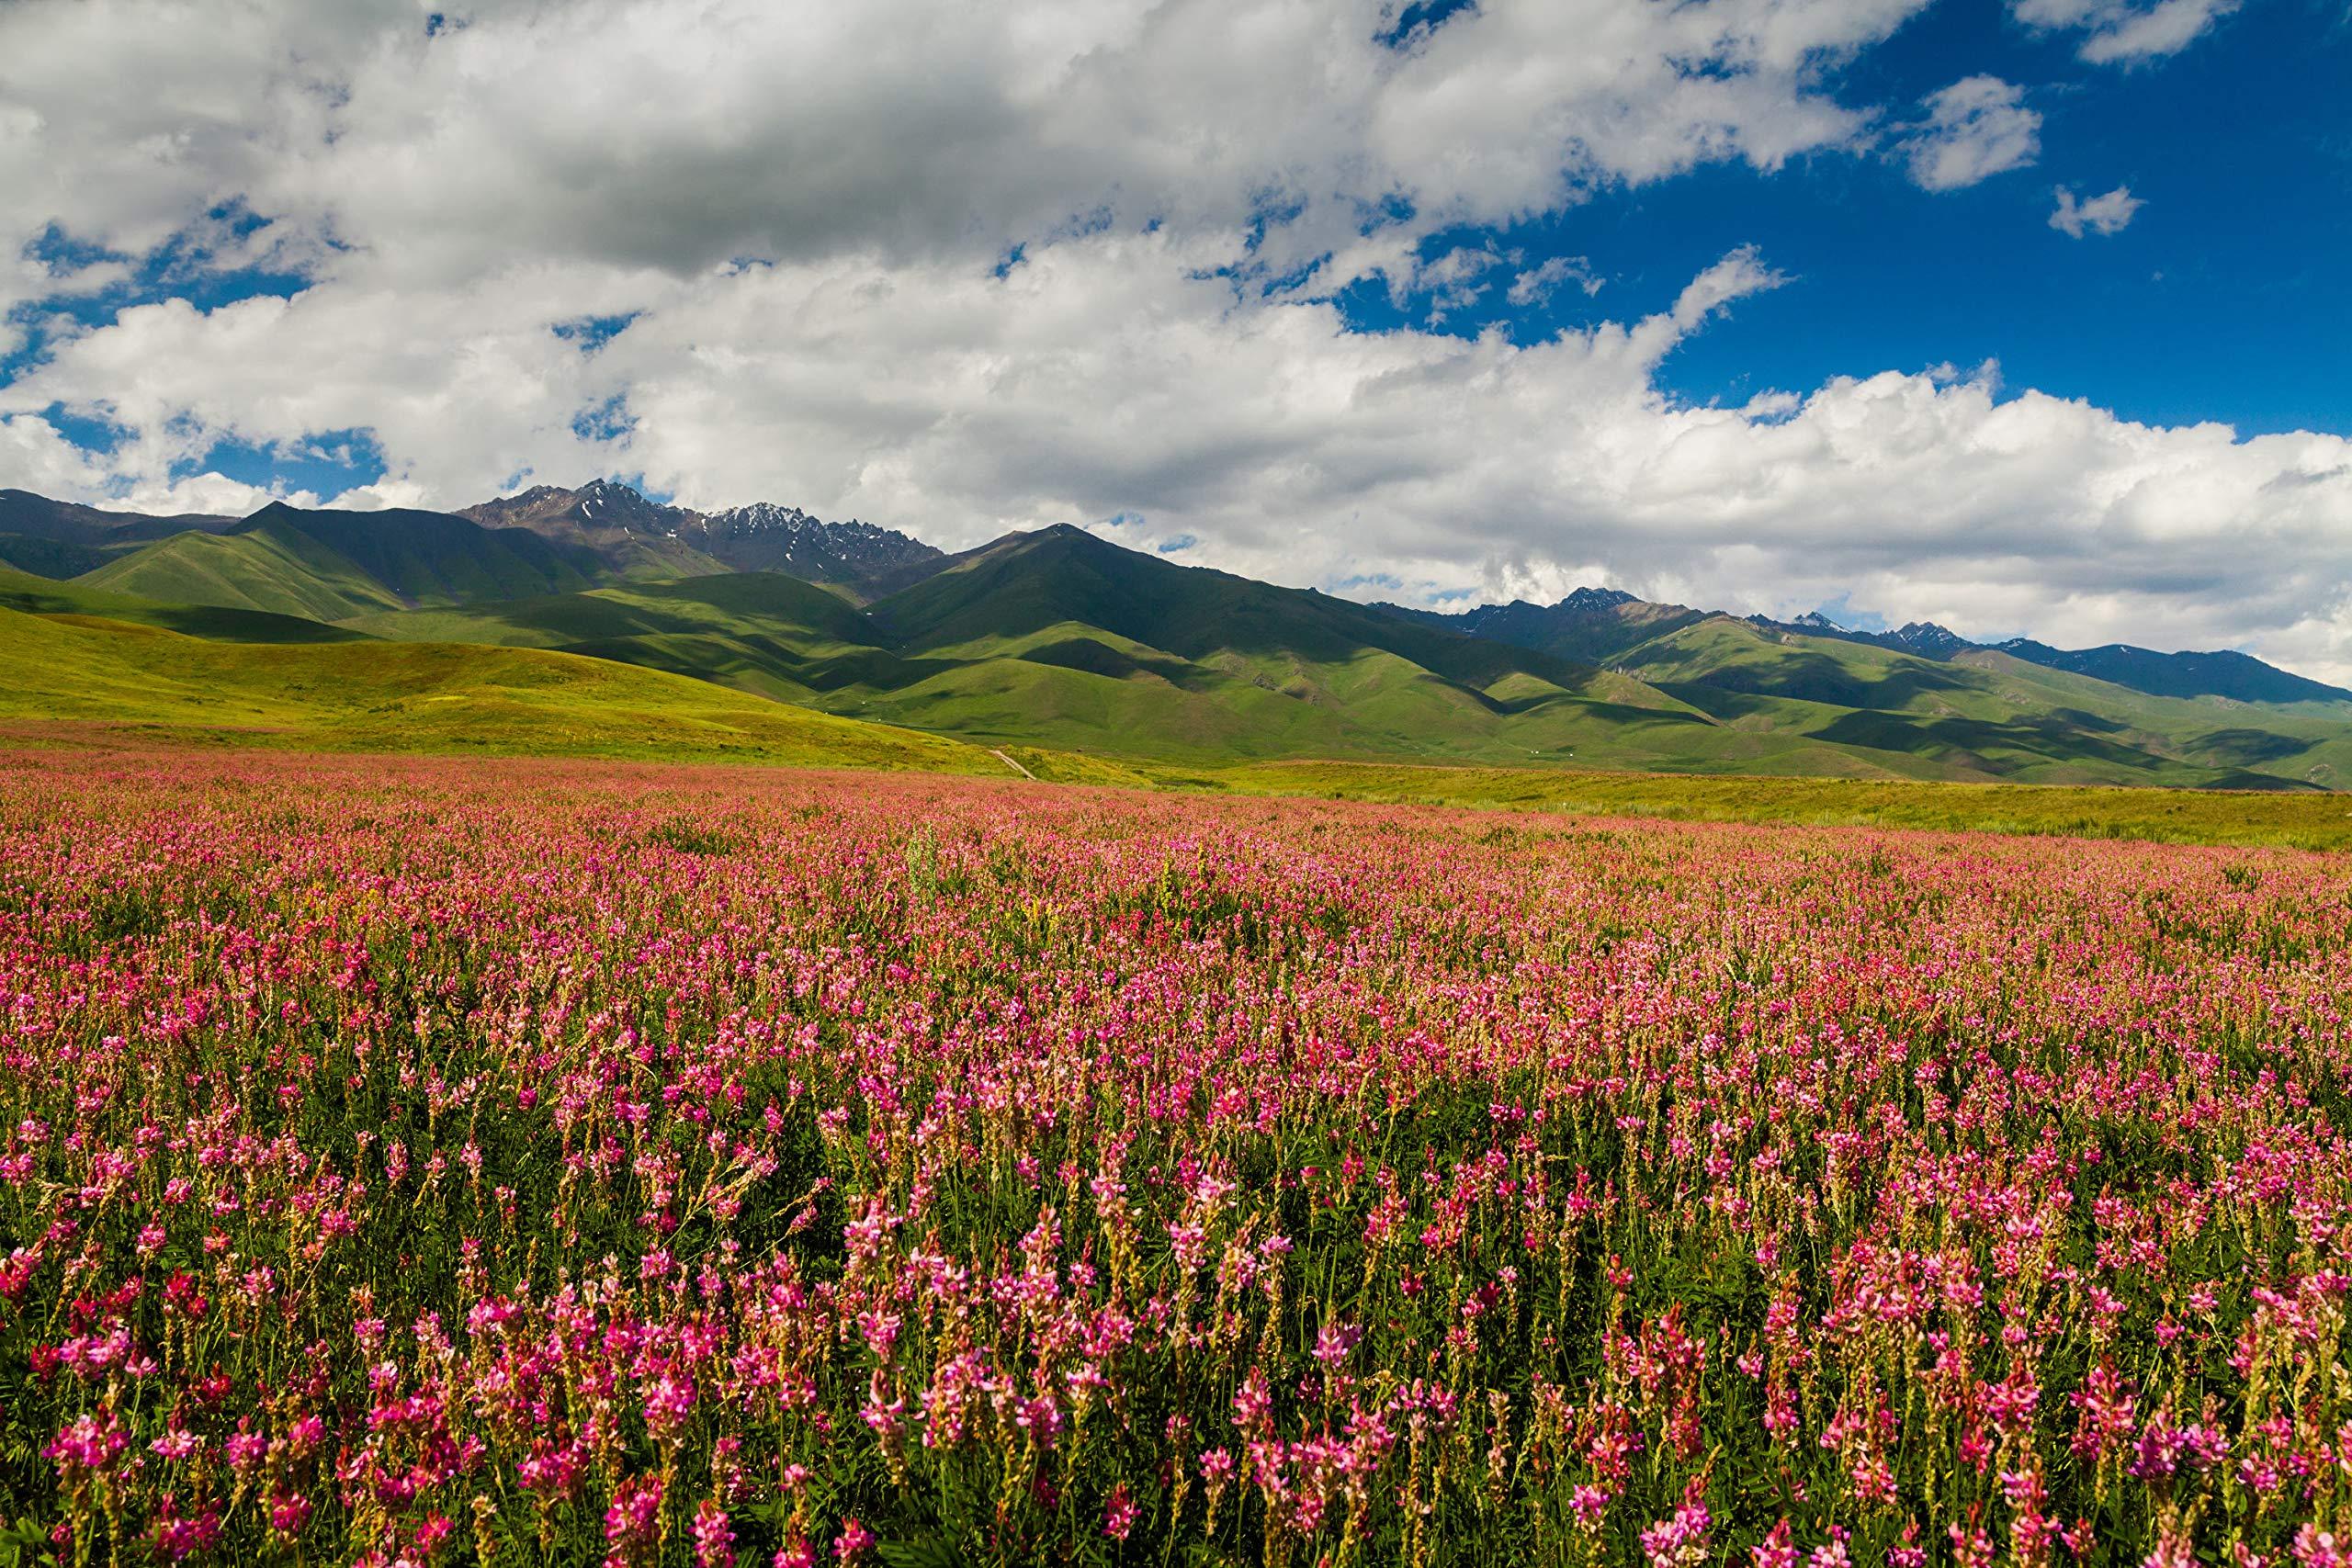 Kyrgyz Honey; Esparcet Raw Natural Sainfoin Mountain Honey; 17.63 Ounce Glass Jar by Mira Nova (Image #5)